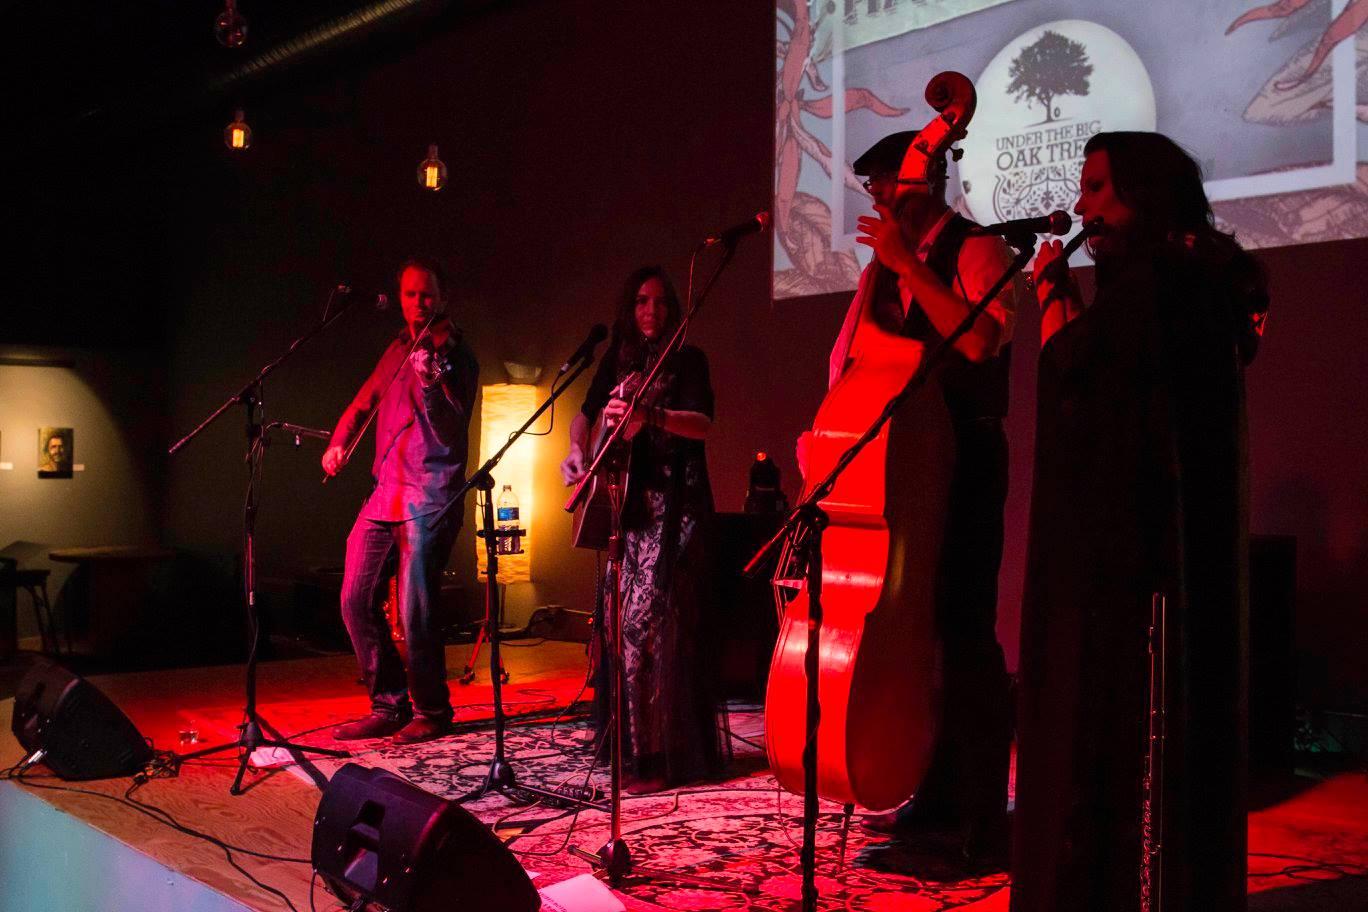 SPECIAL EVENTS - Corporate EventsPrivate PartiesClass ReunionsFilm FestivalsLive Music